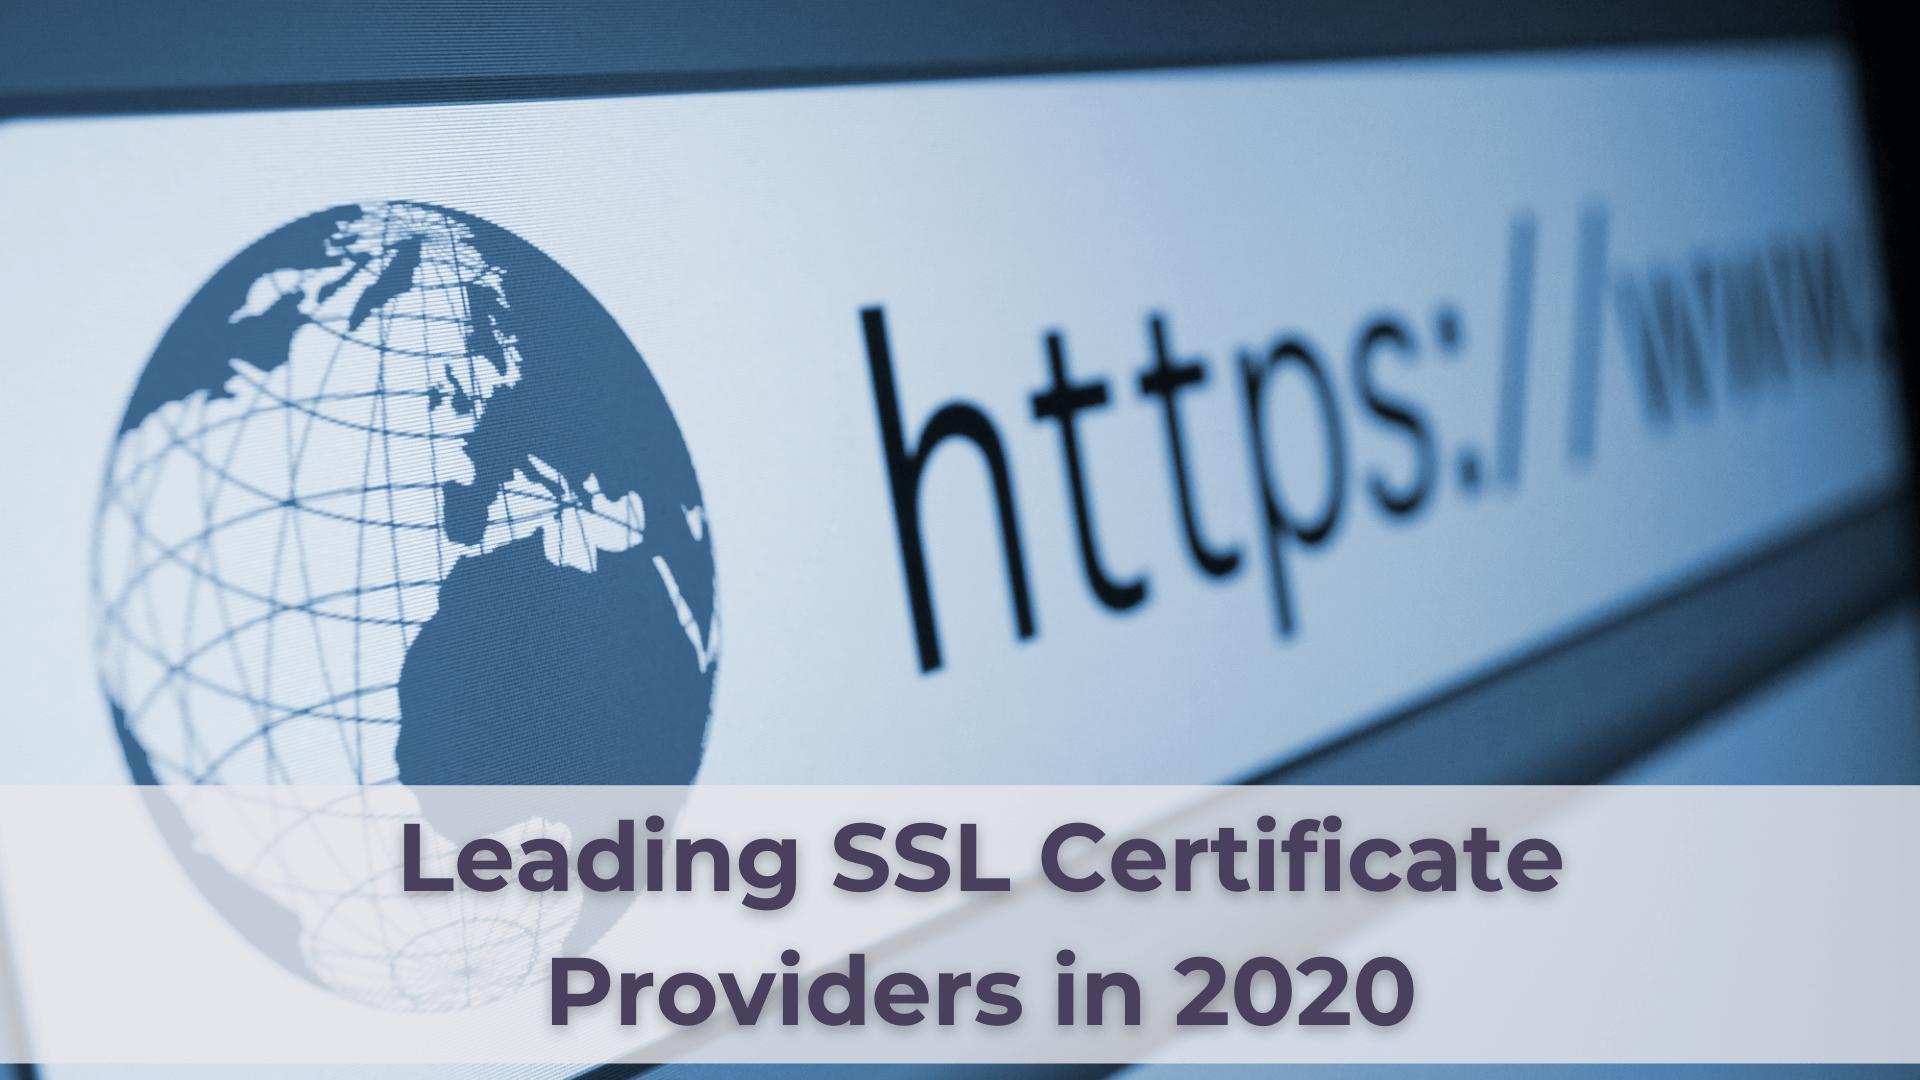 Leading-SSL-Certificate-Providers-in-2020-1